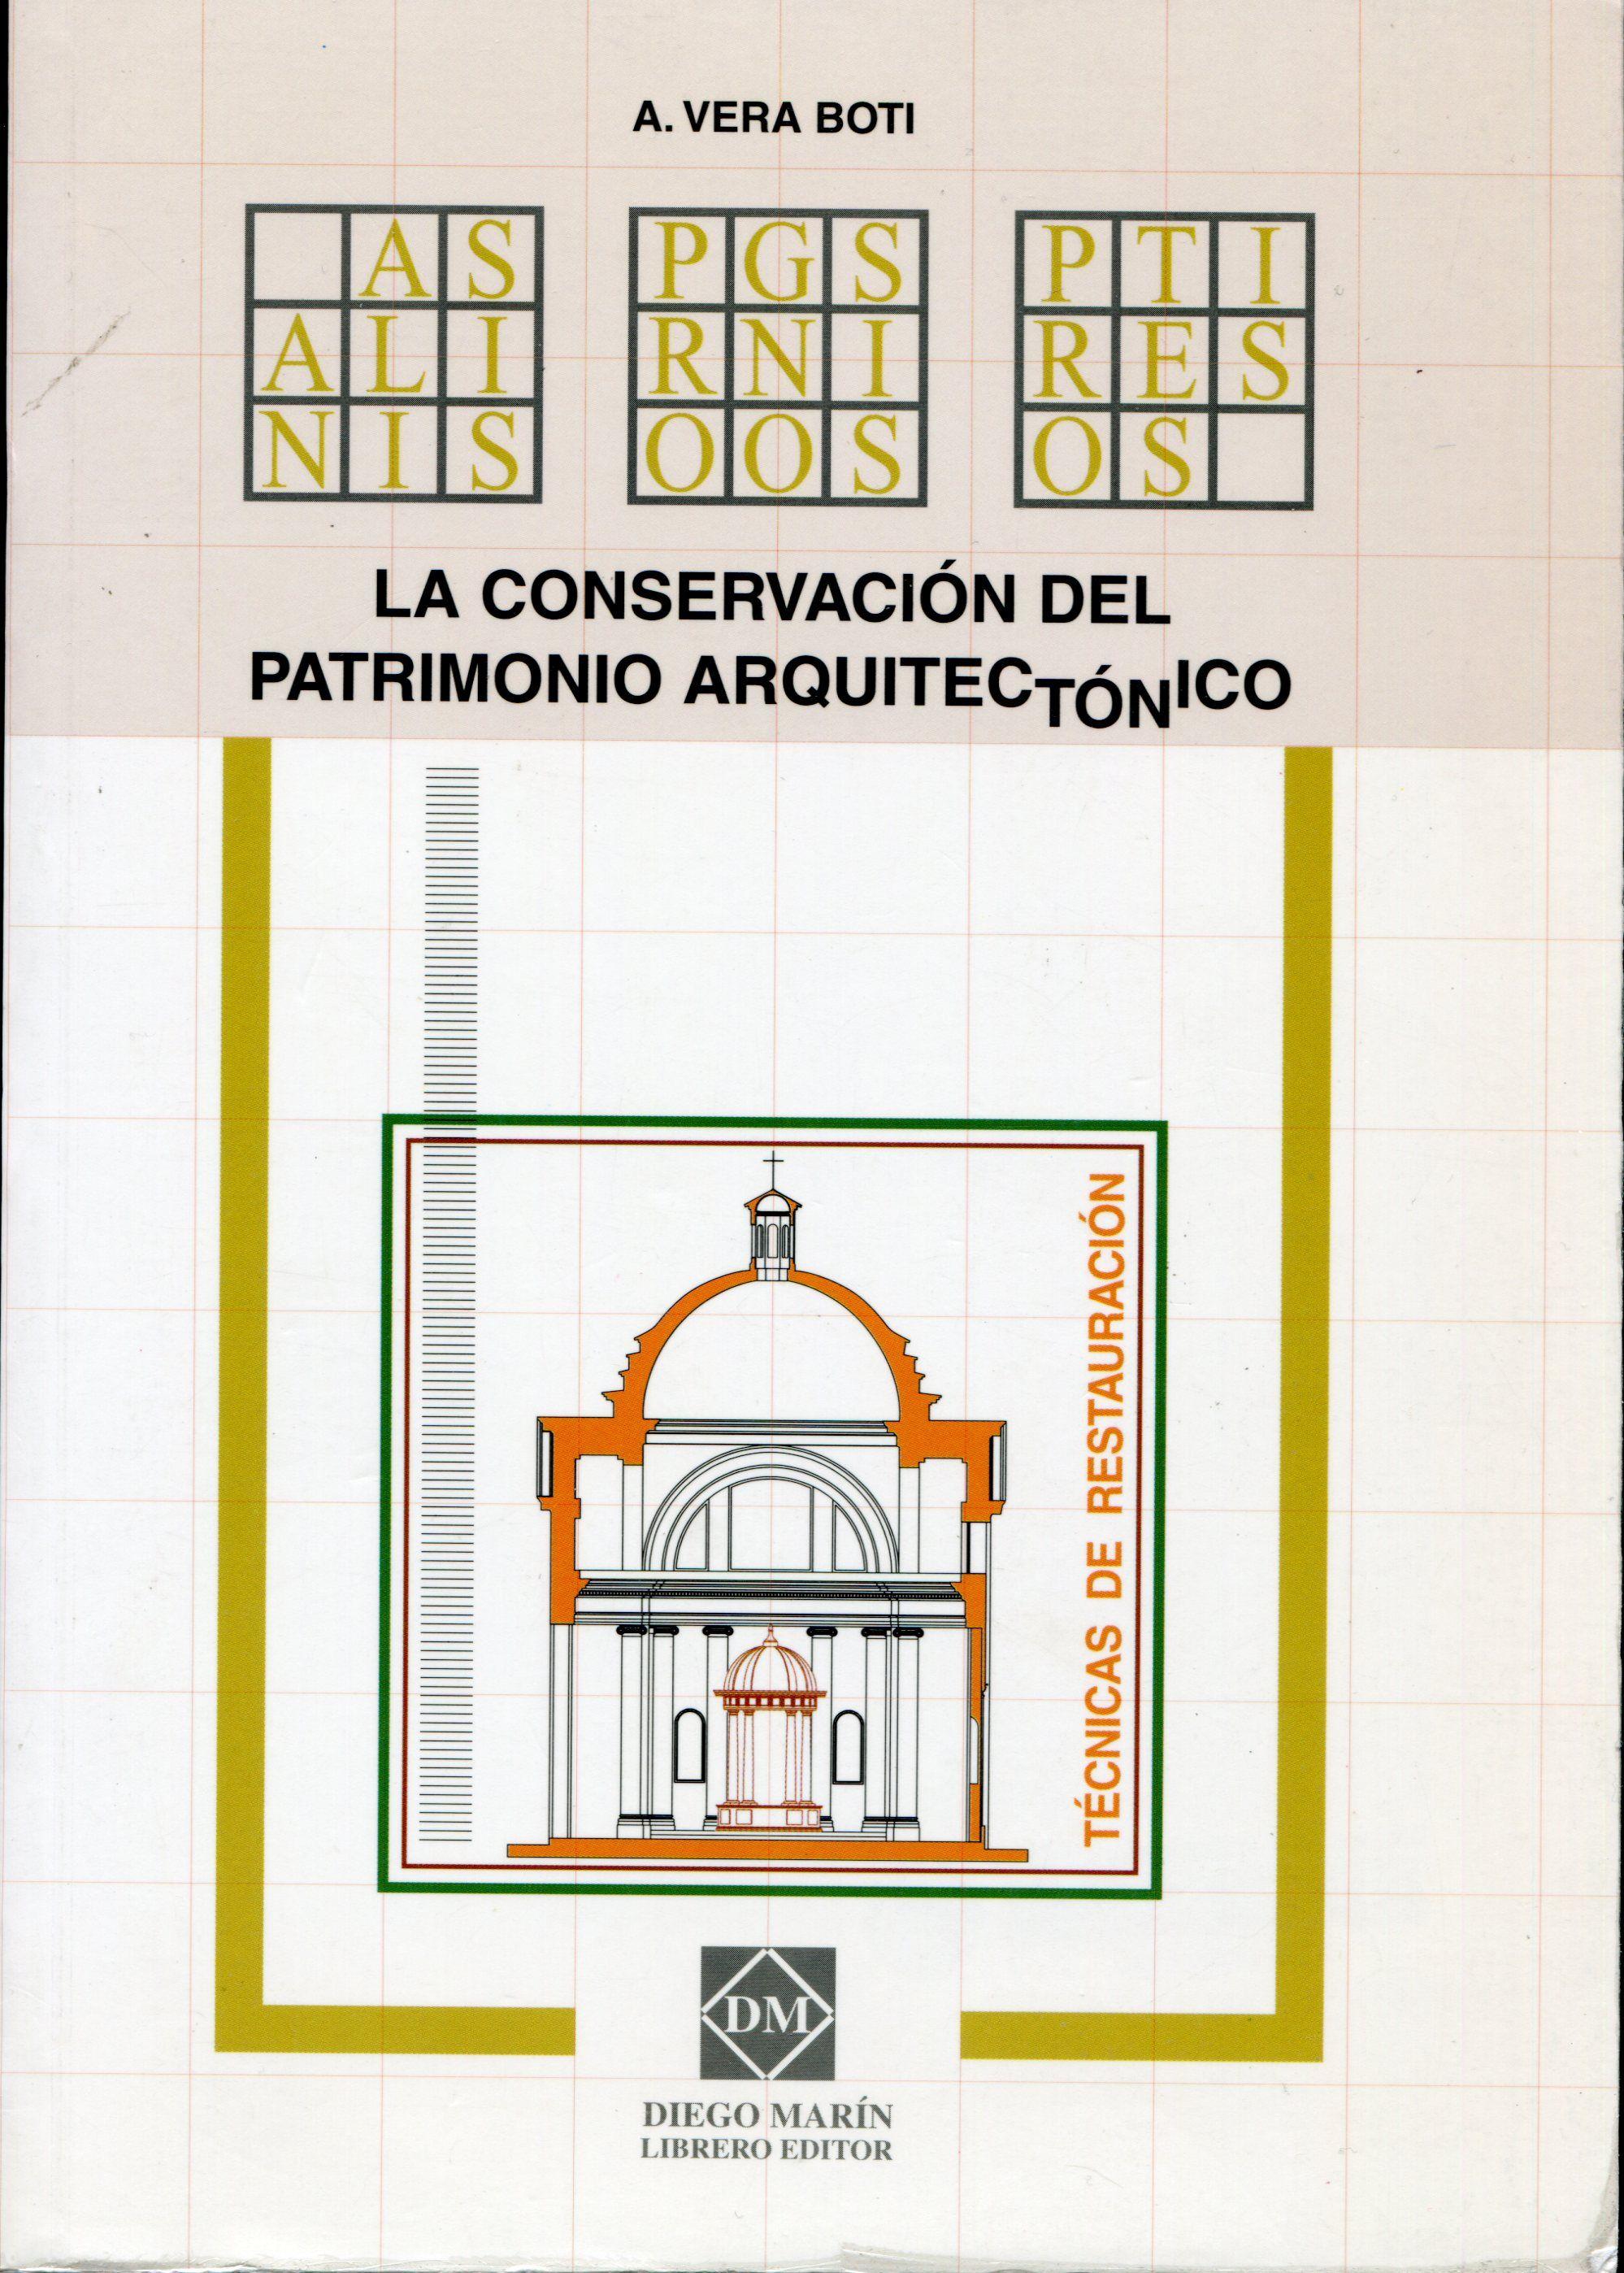 Conservación del patrimonio arquitectónico : técnicas / Alfredo Vera Boti ;[Edición a cargo de : Diego Marín]. + info: http://www.diegomarin.net/shop/es/376963-conservacion-del-patrimonio-arquitectonico-la-tecnicas-9788484253174.html